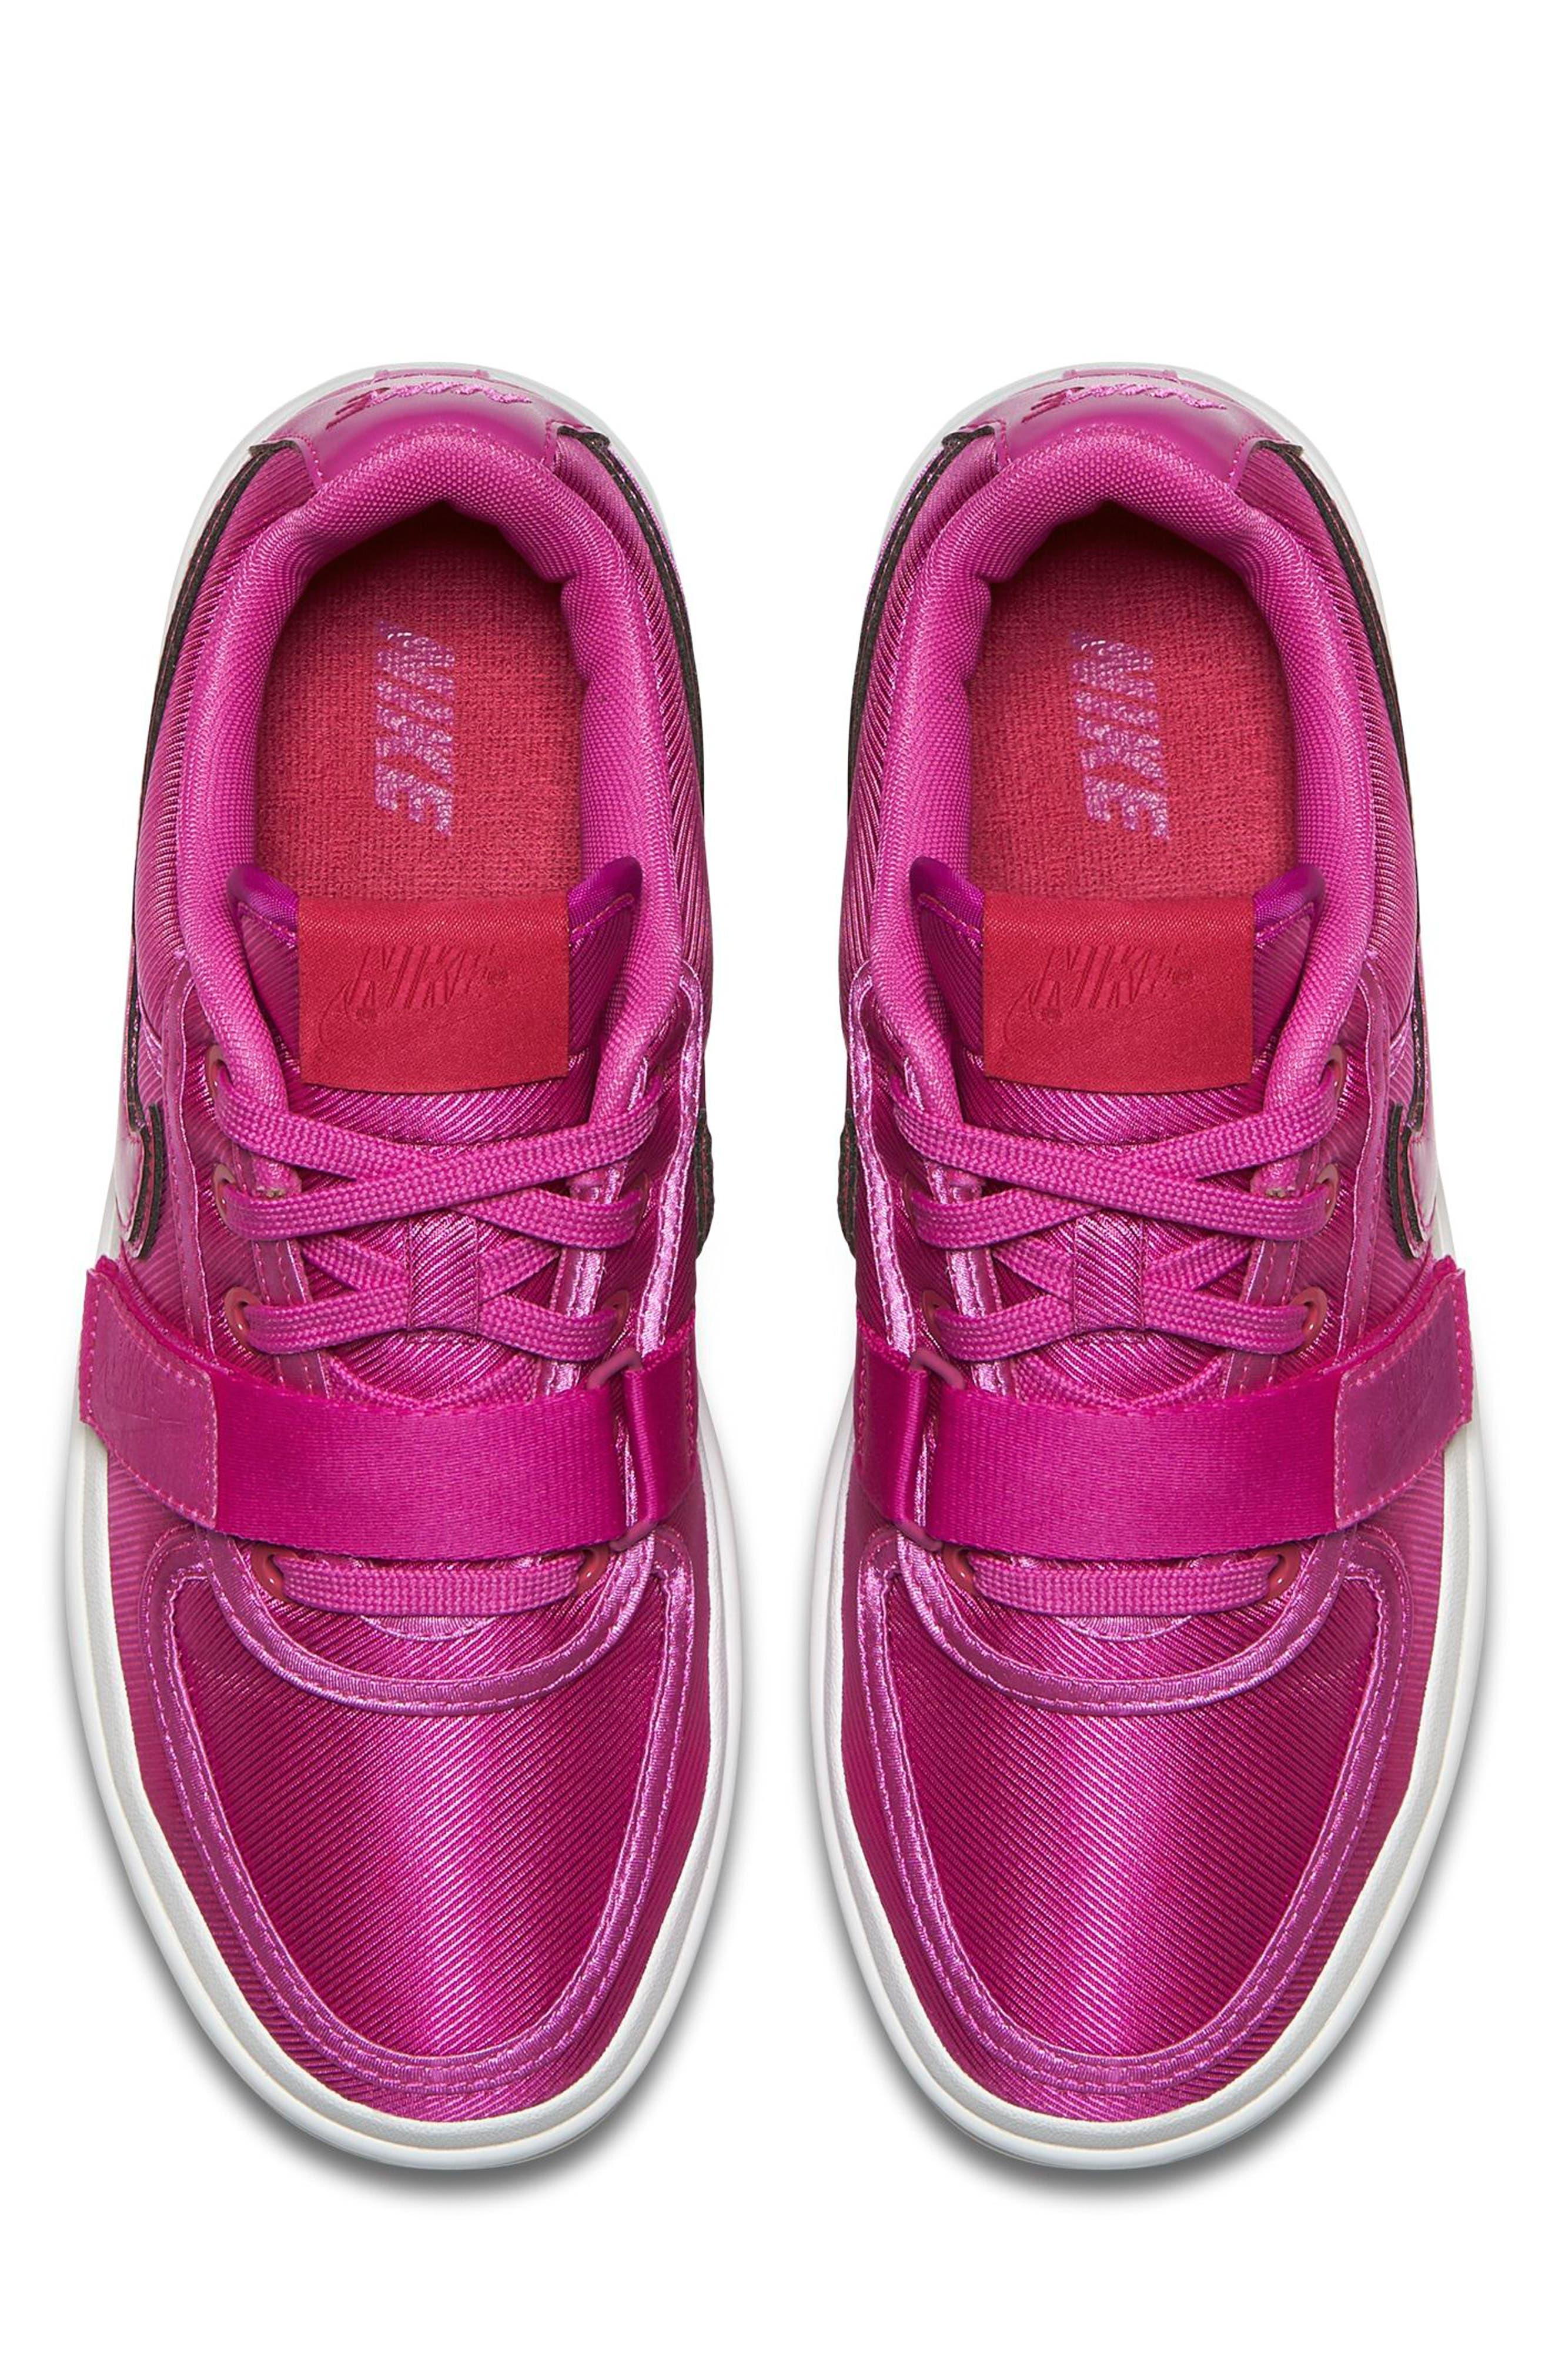 Vandal 2K Sneaker,                             Alternate thumbnail 4, color,                             HYPER MAGENTA/ SUMMIT/ FUCHSIA